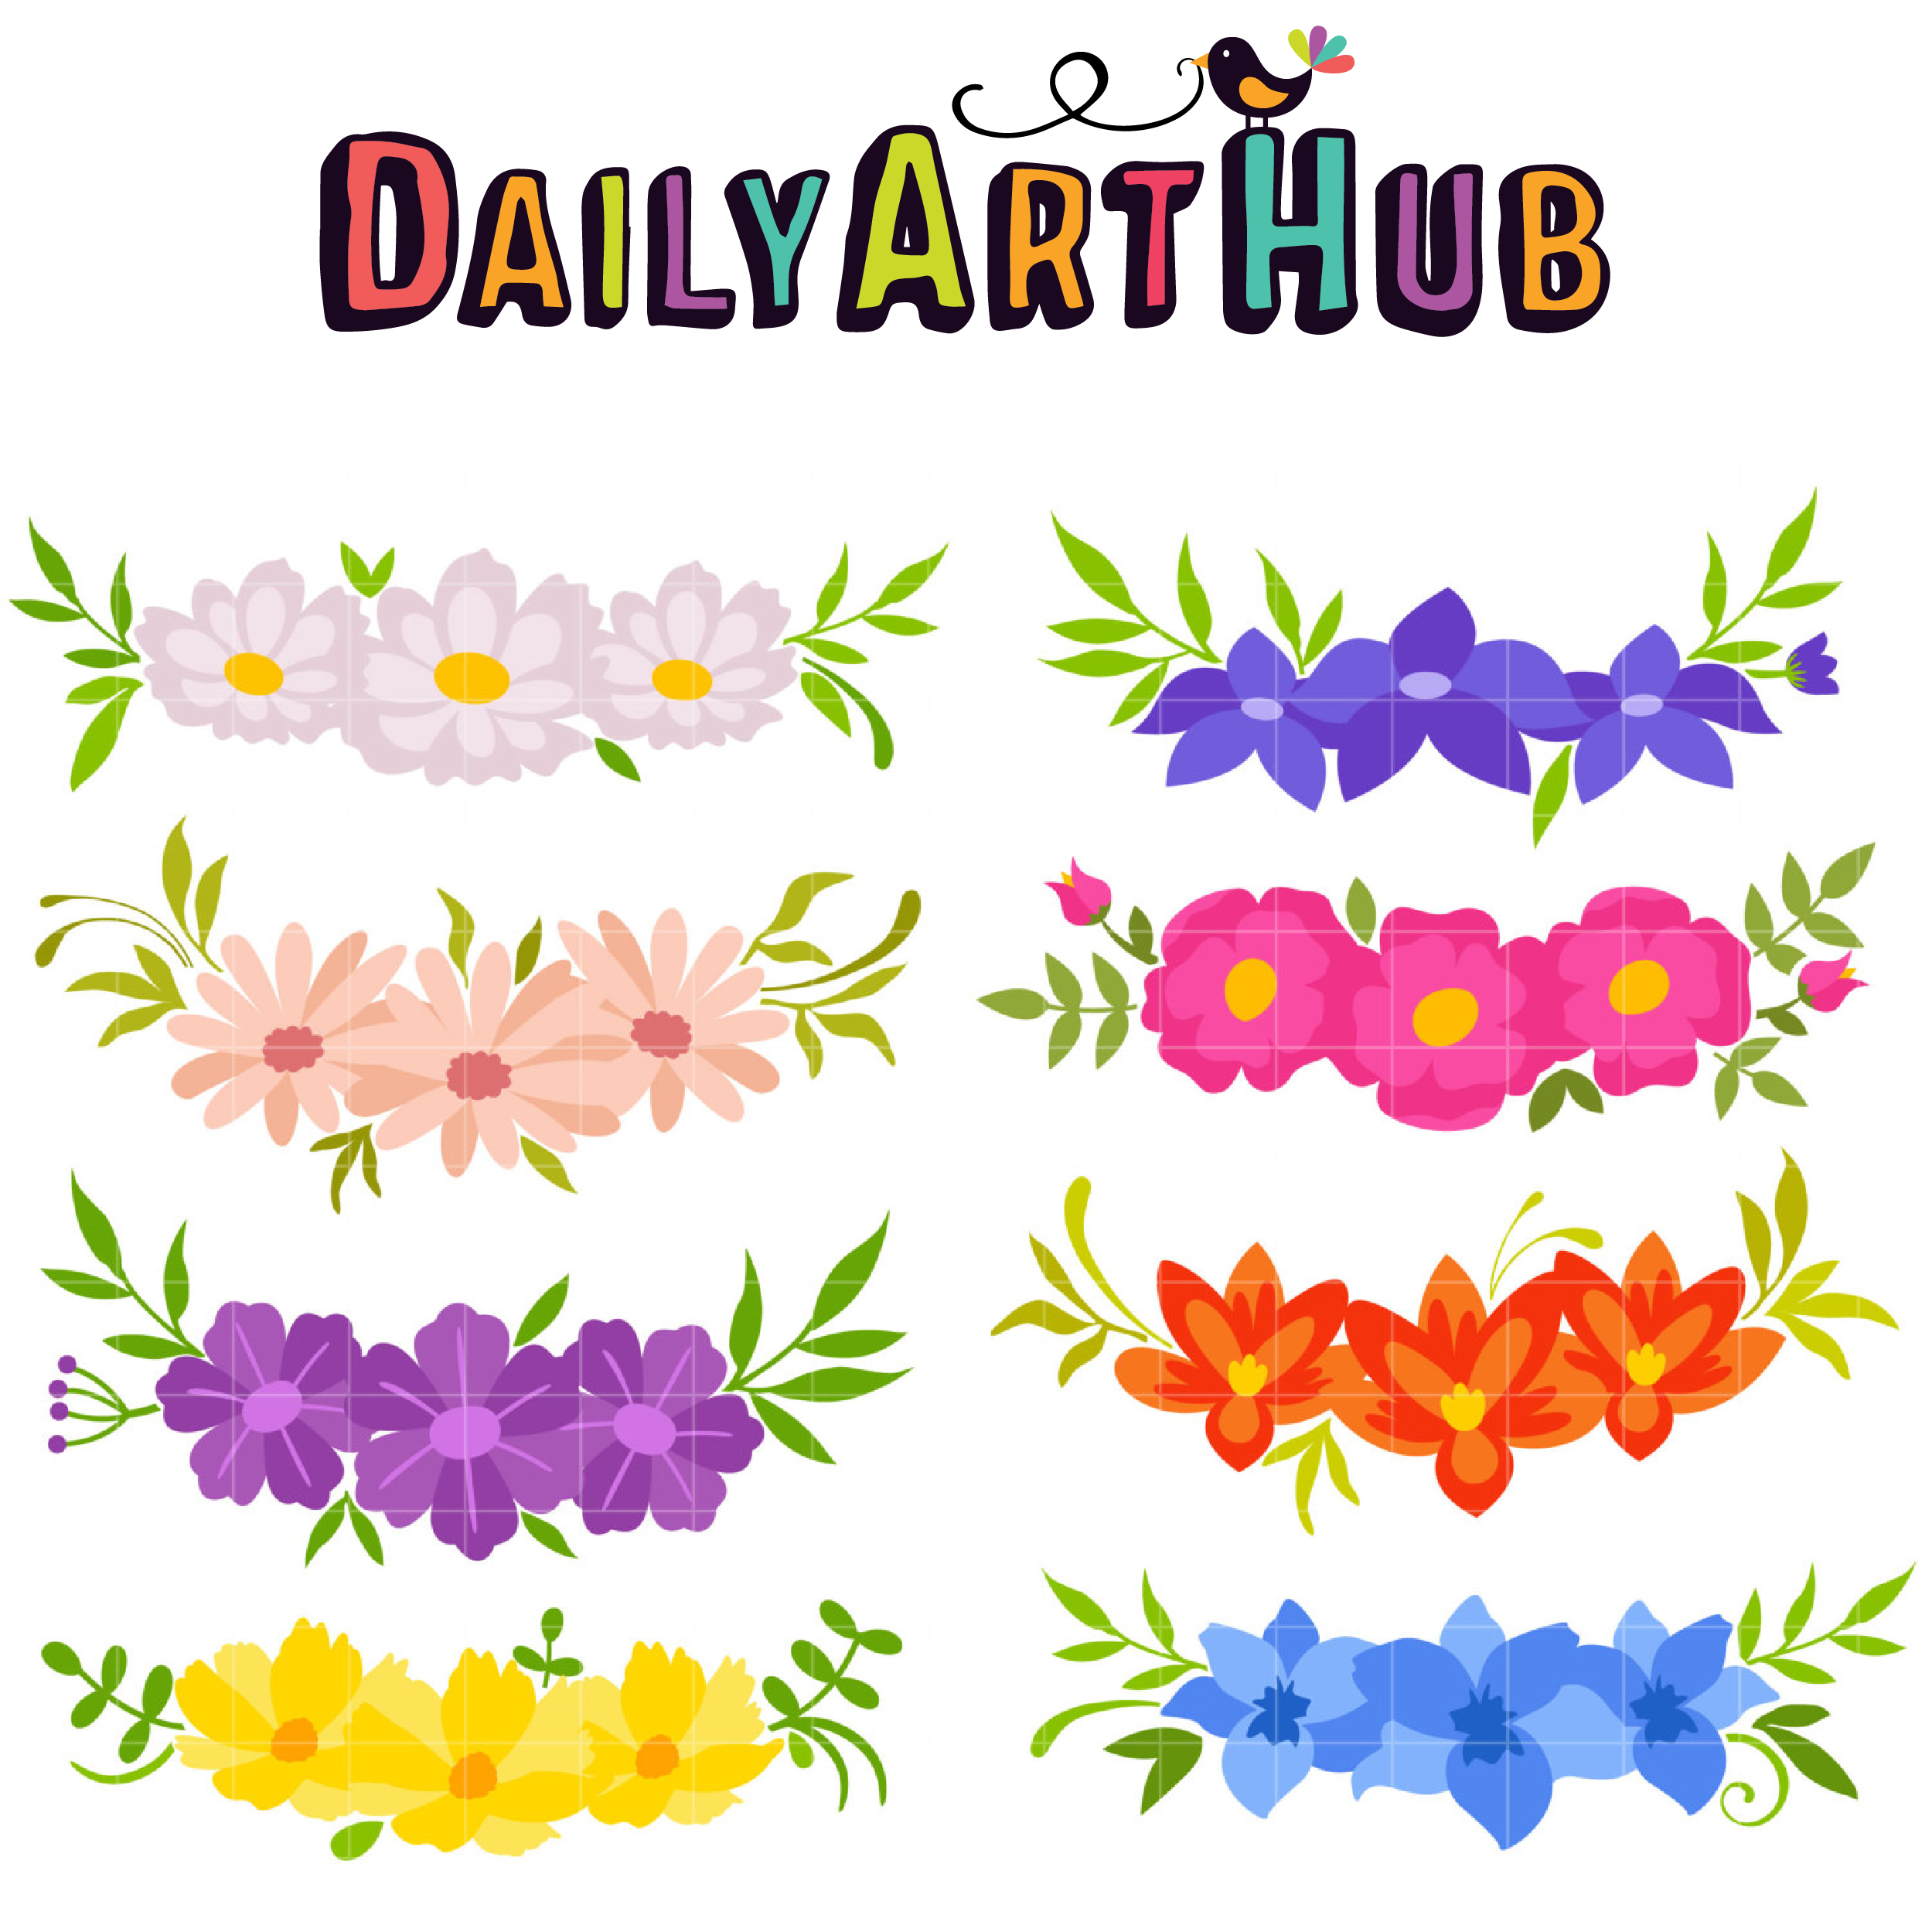 flower crowns clip art set daily art hub free clip art everyday rh dailyarthub com free floral clip art designs free floral clipart to print